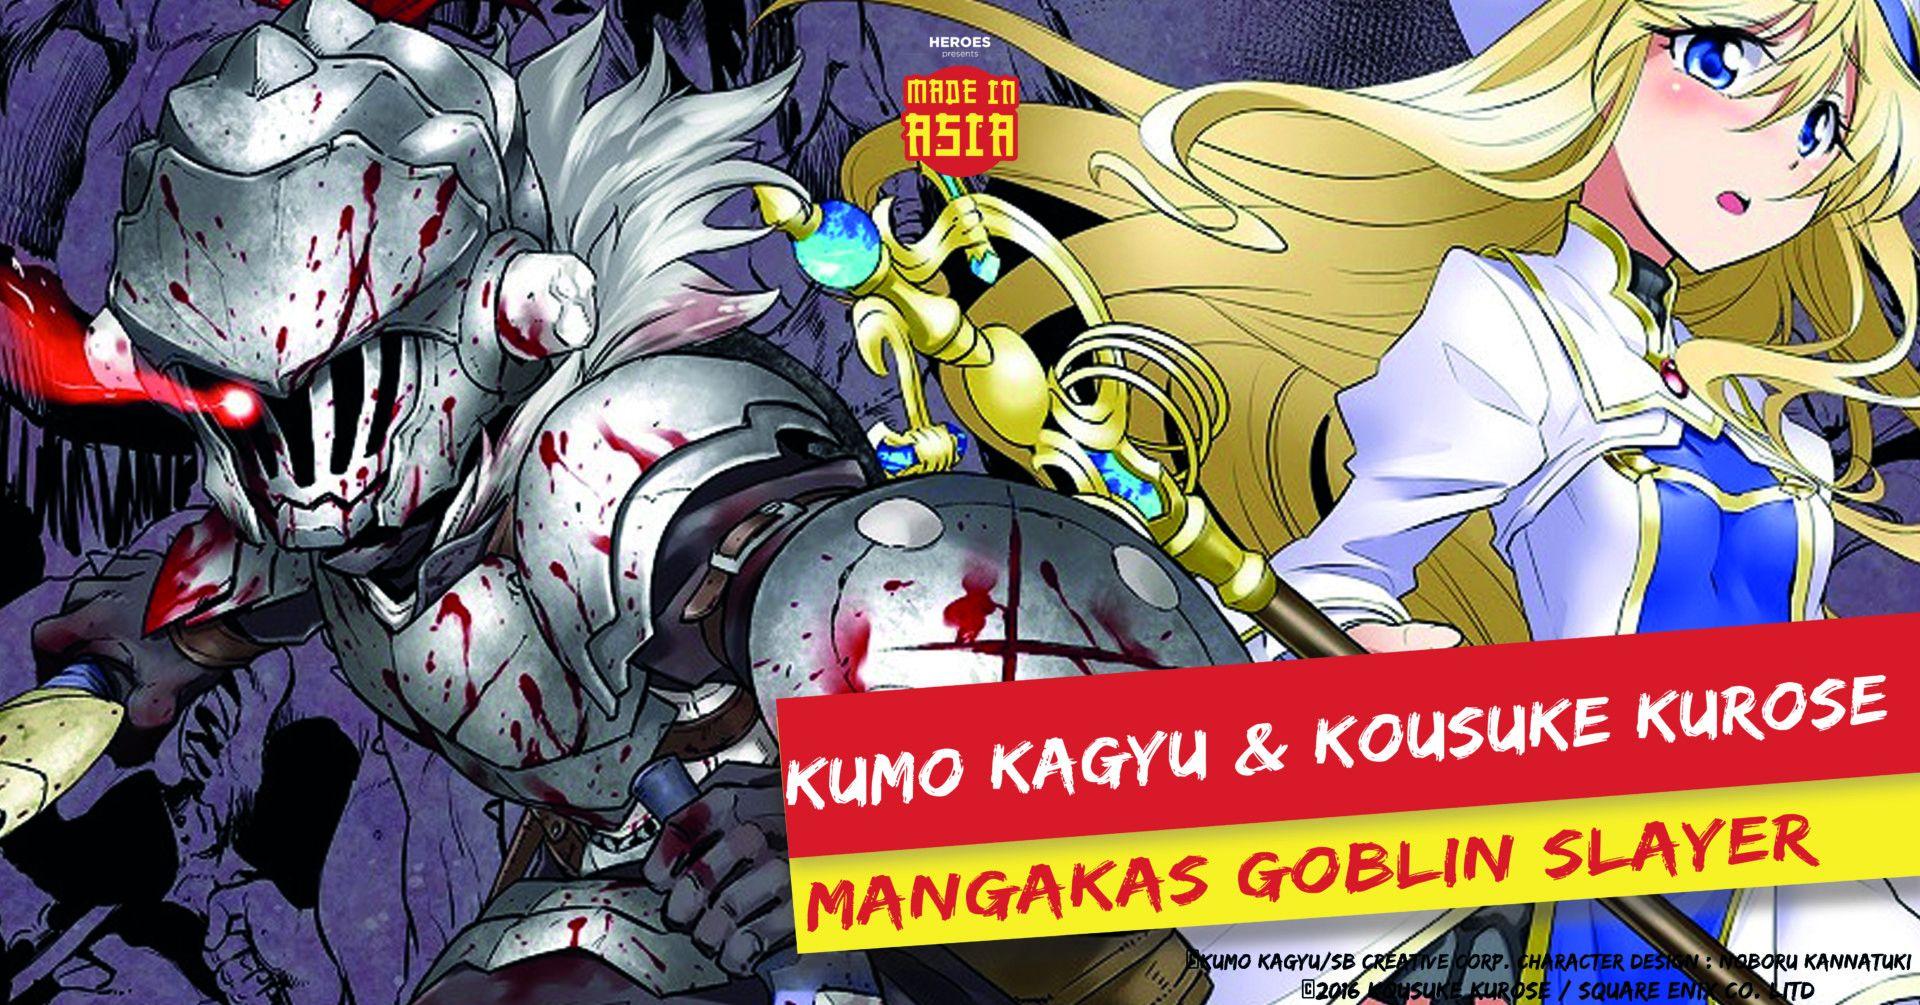 Goblin-Slayer-auteurs-Made-in-asia-2020.jpg